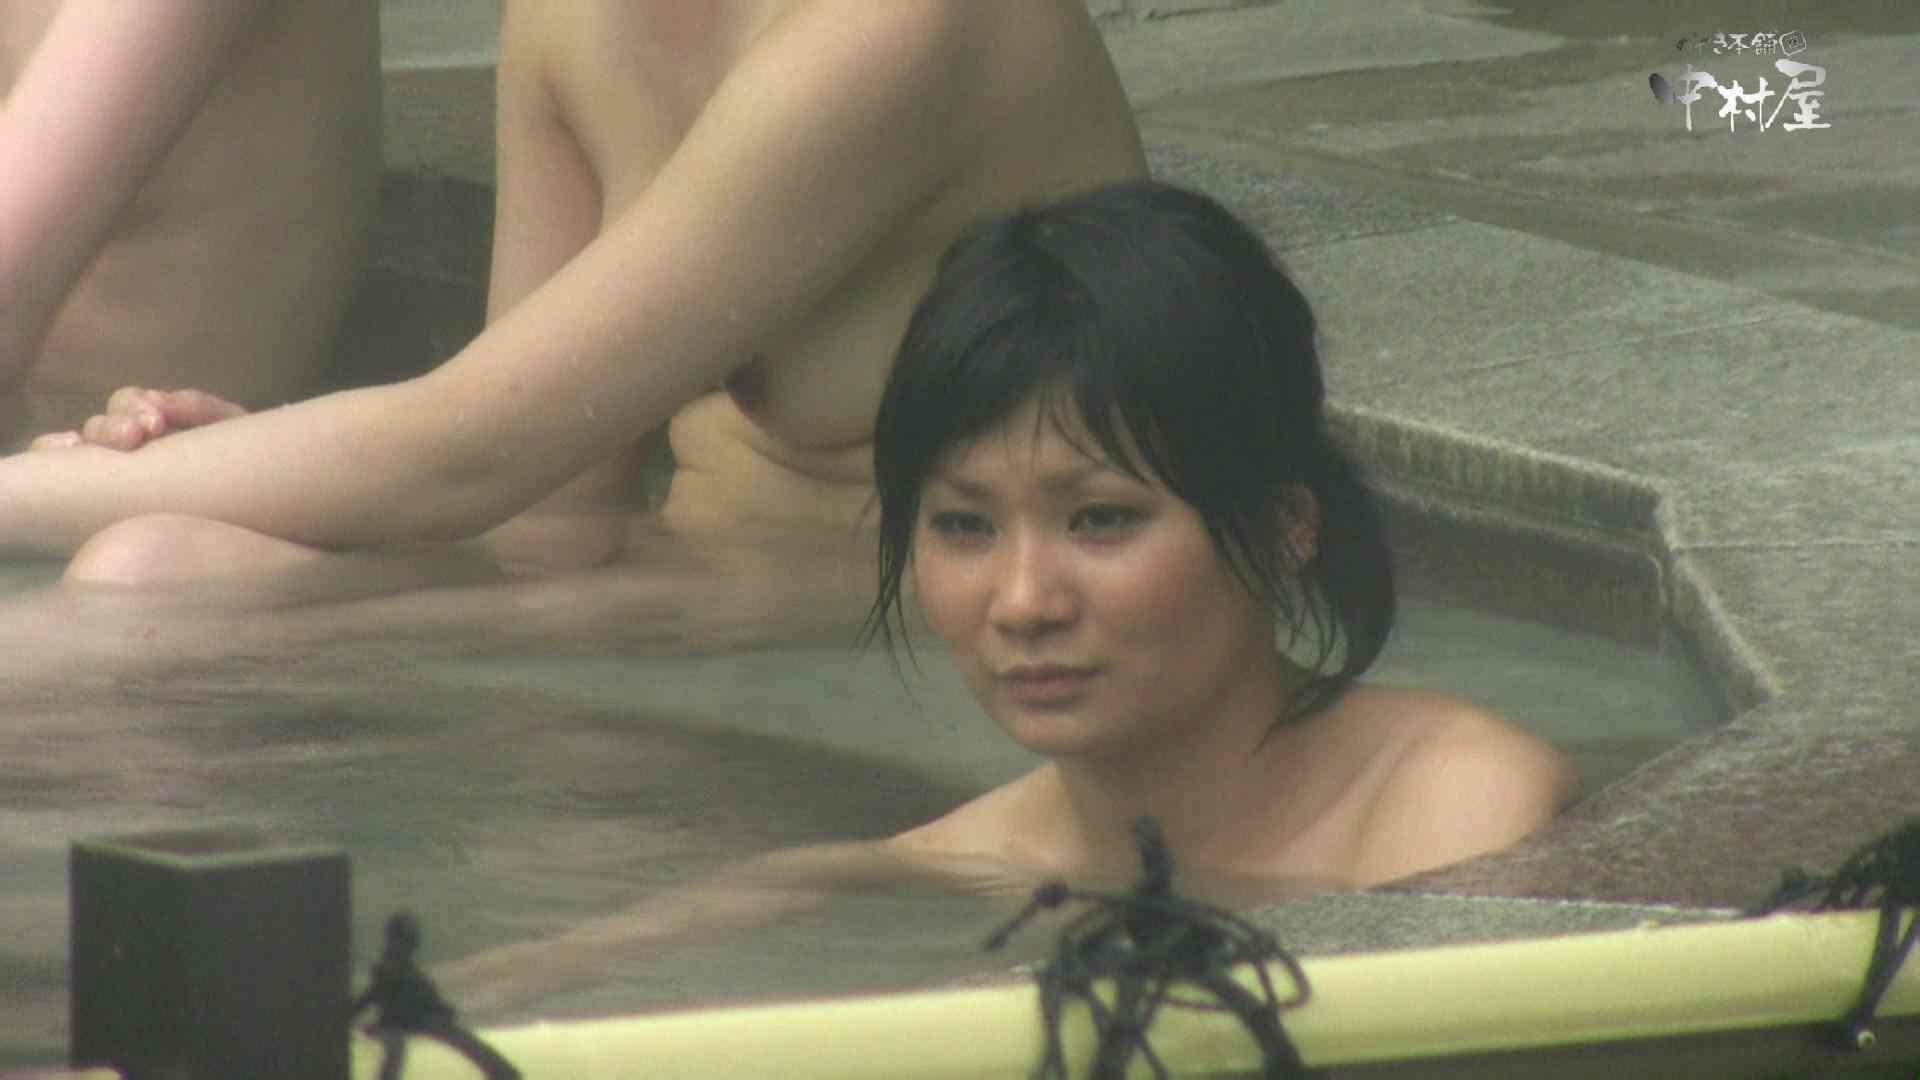 Aquaな露天風呂Vol.890 OLセックス  51画像 6